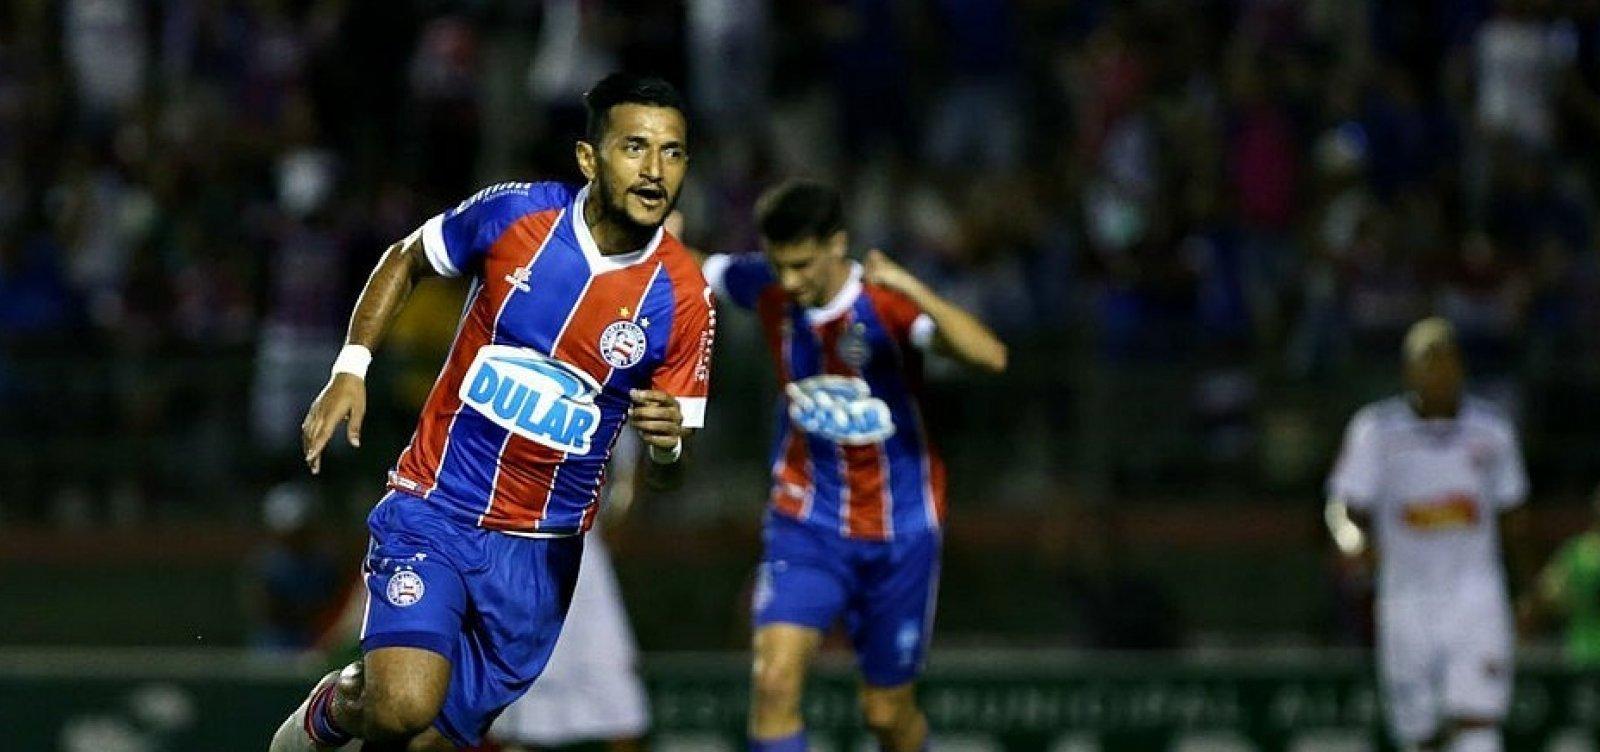 [Cotado para titular contra o Palmeiras, Rogério é vetado pelo departamento médico do Bahia]